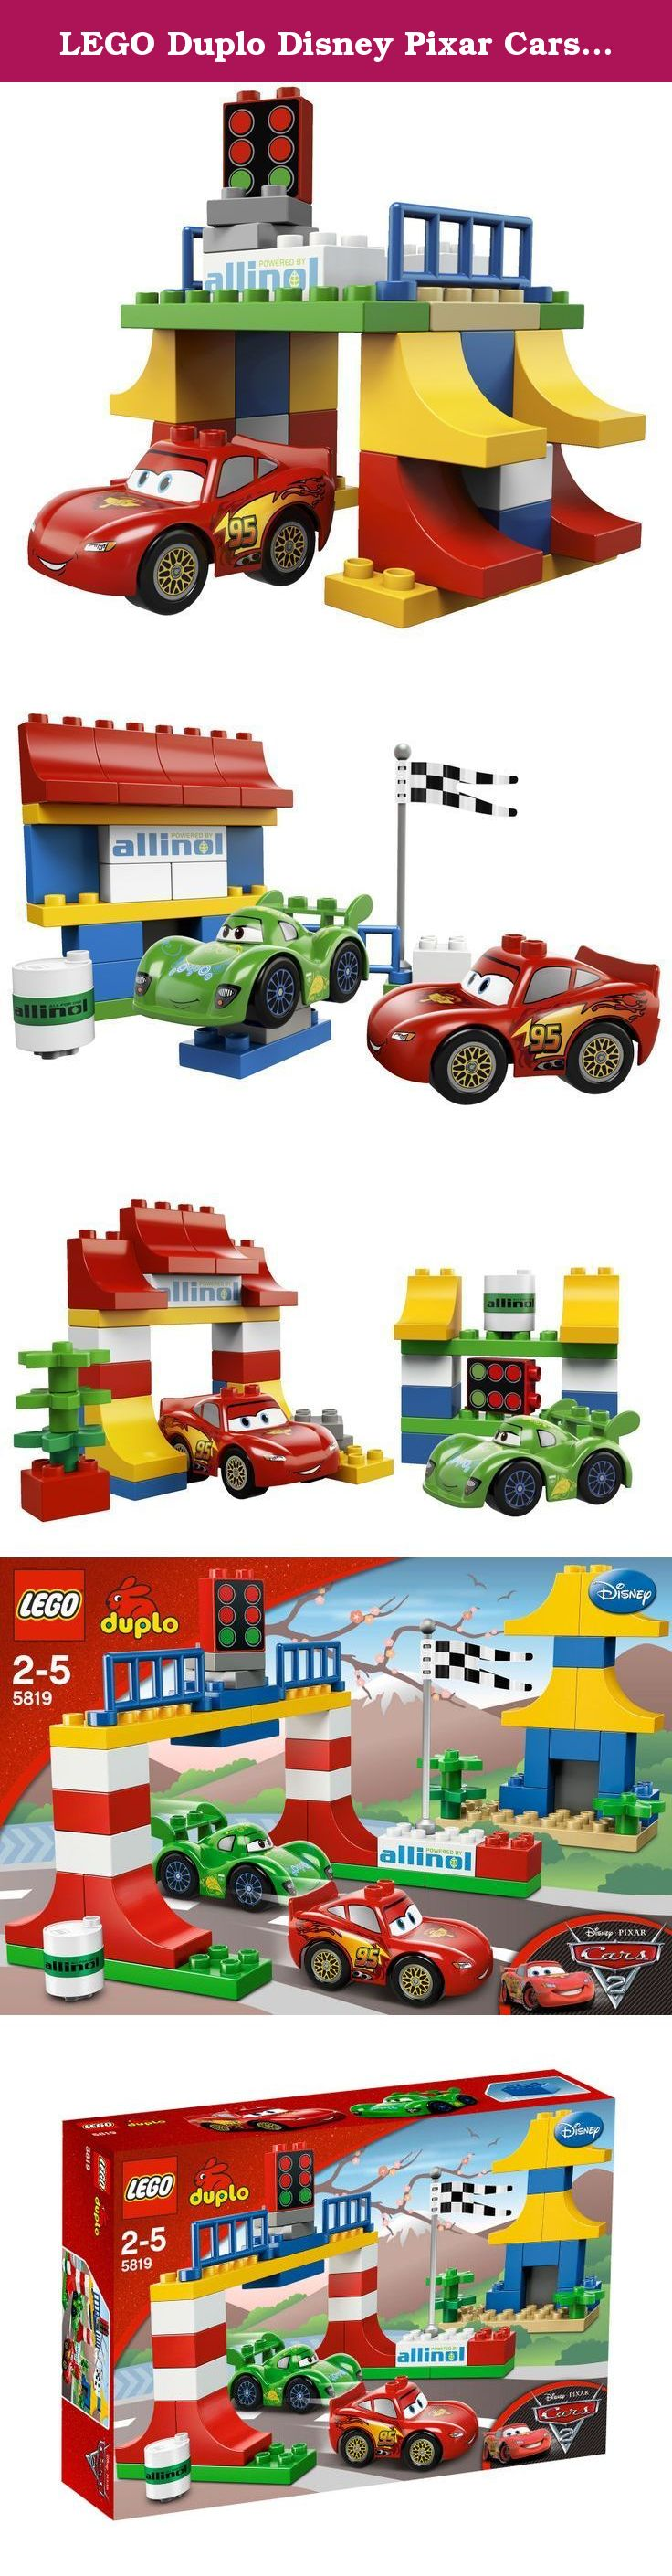 Lego Duplo Disney Pixar Cars 2 Tokyo Racing 5819 Your Favourite